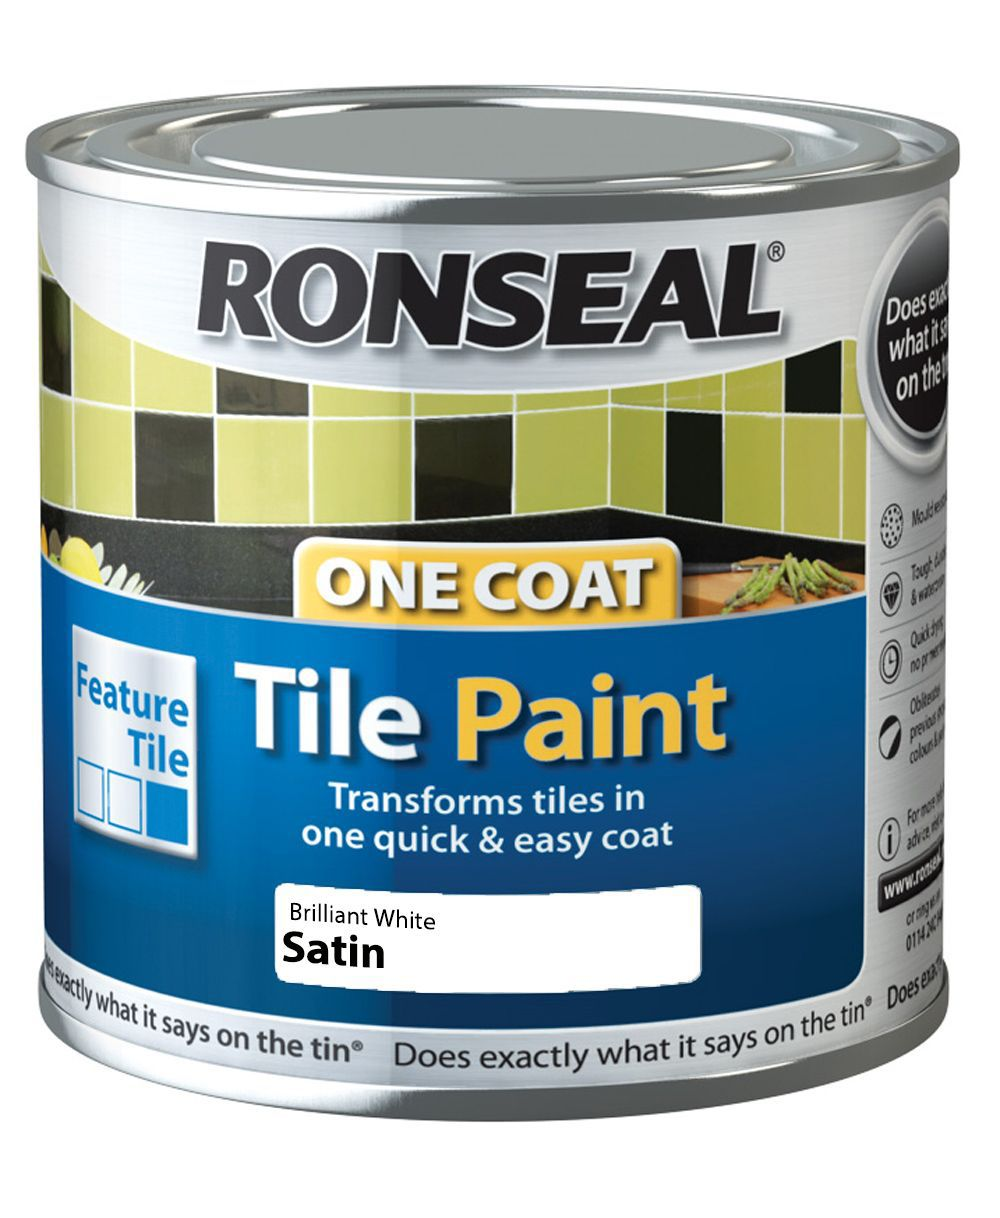 ronseal brilliant white satin tile paint0 25l departments diy at b q